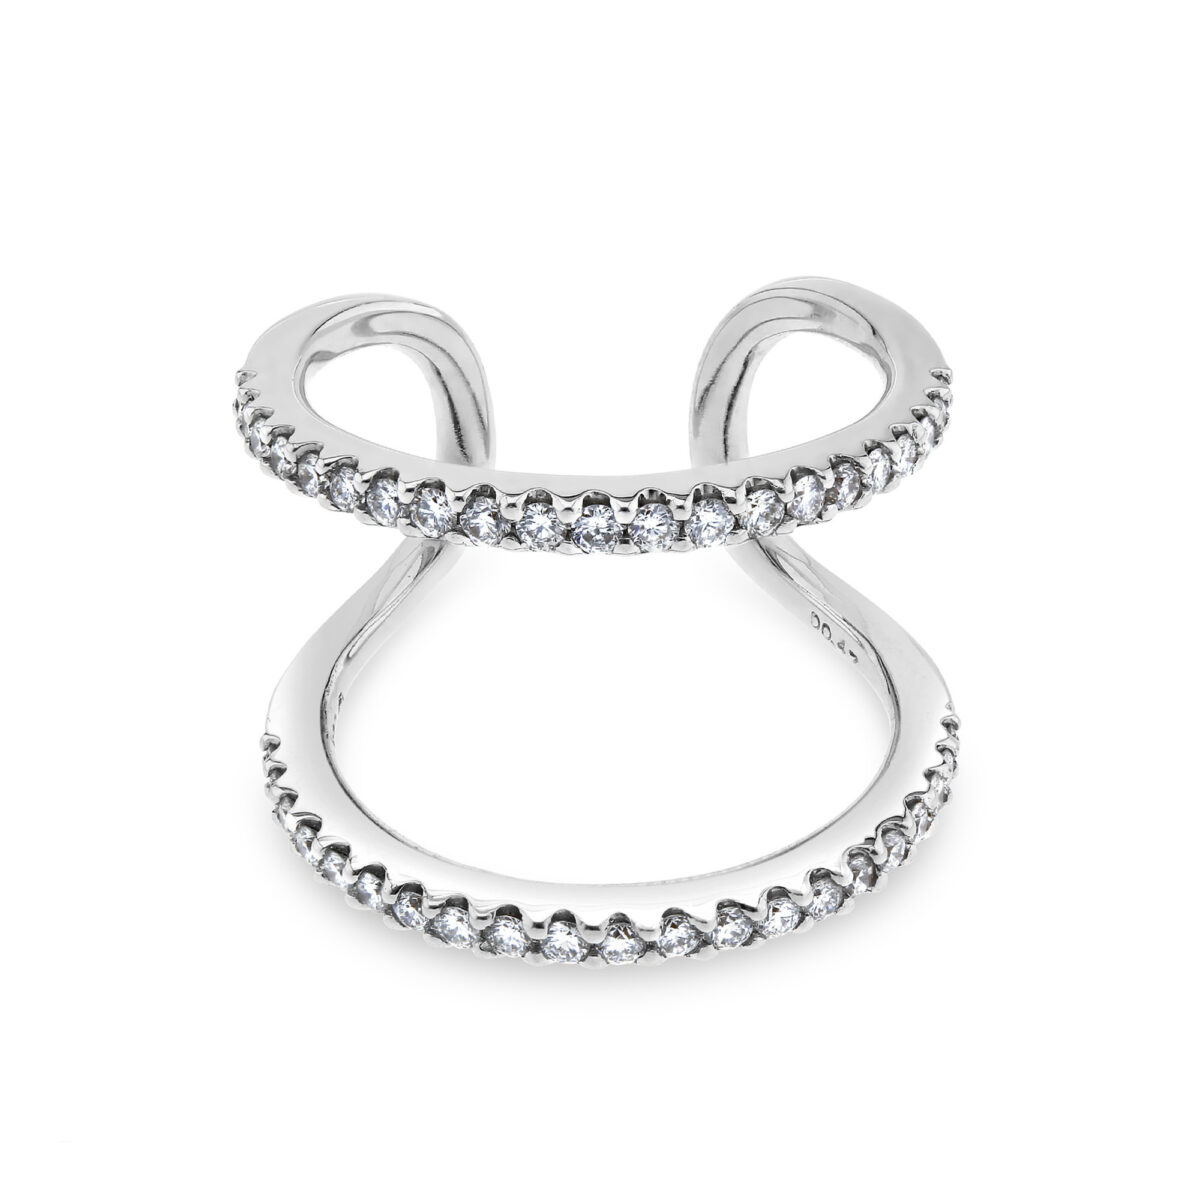 product/d/o/double-diamond-ring-1.jpg;;product/d/o/double-diamond-ring-3.jpg;;product/d/m/dmr-packaging_123.jpg